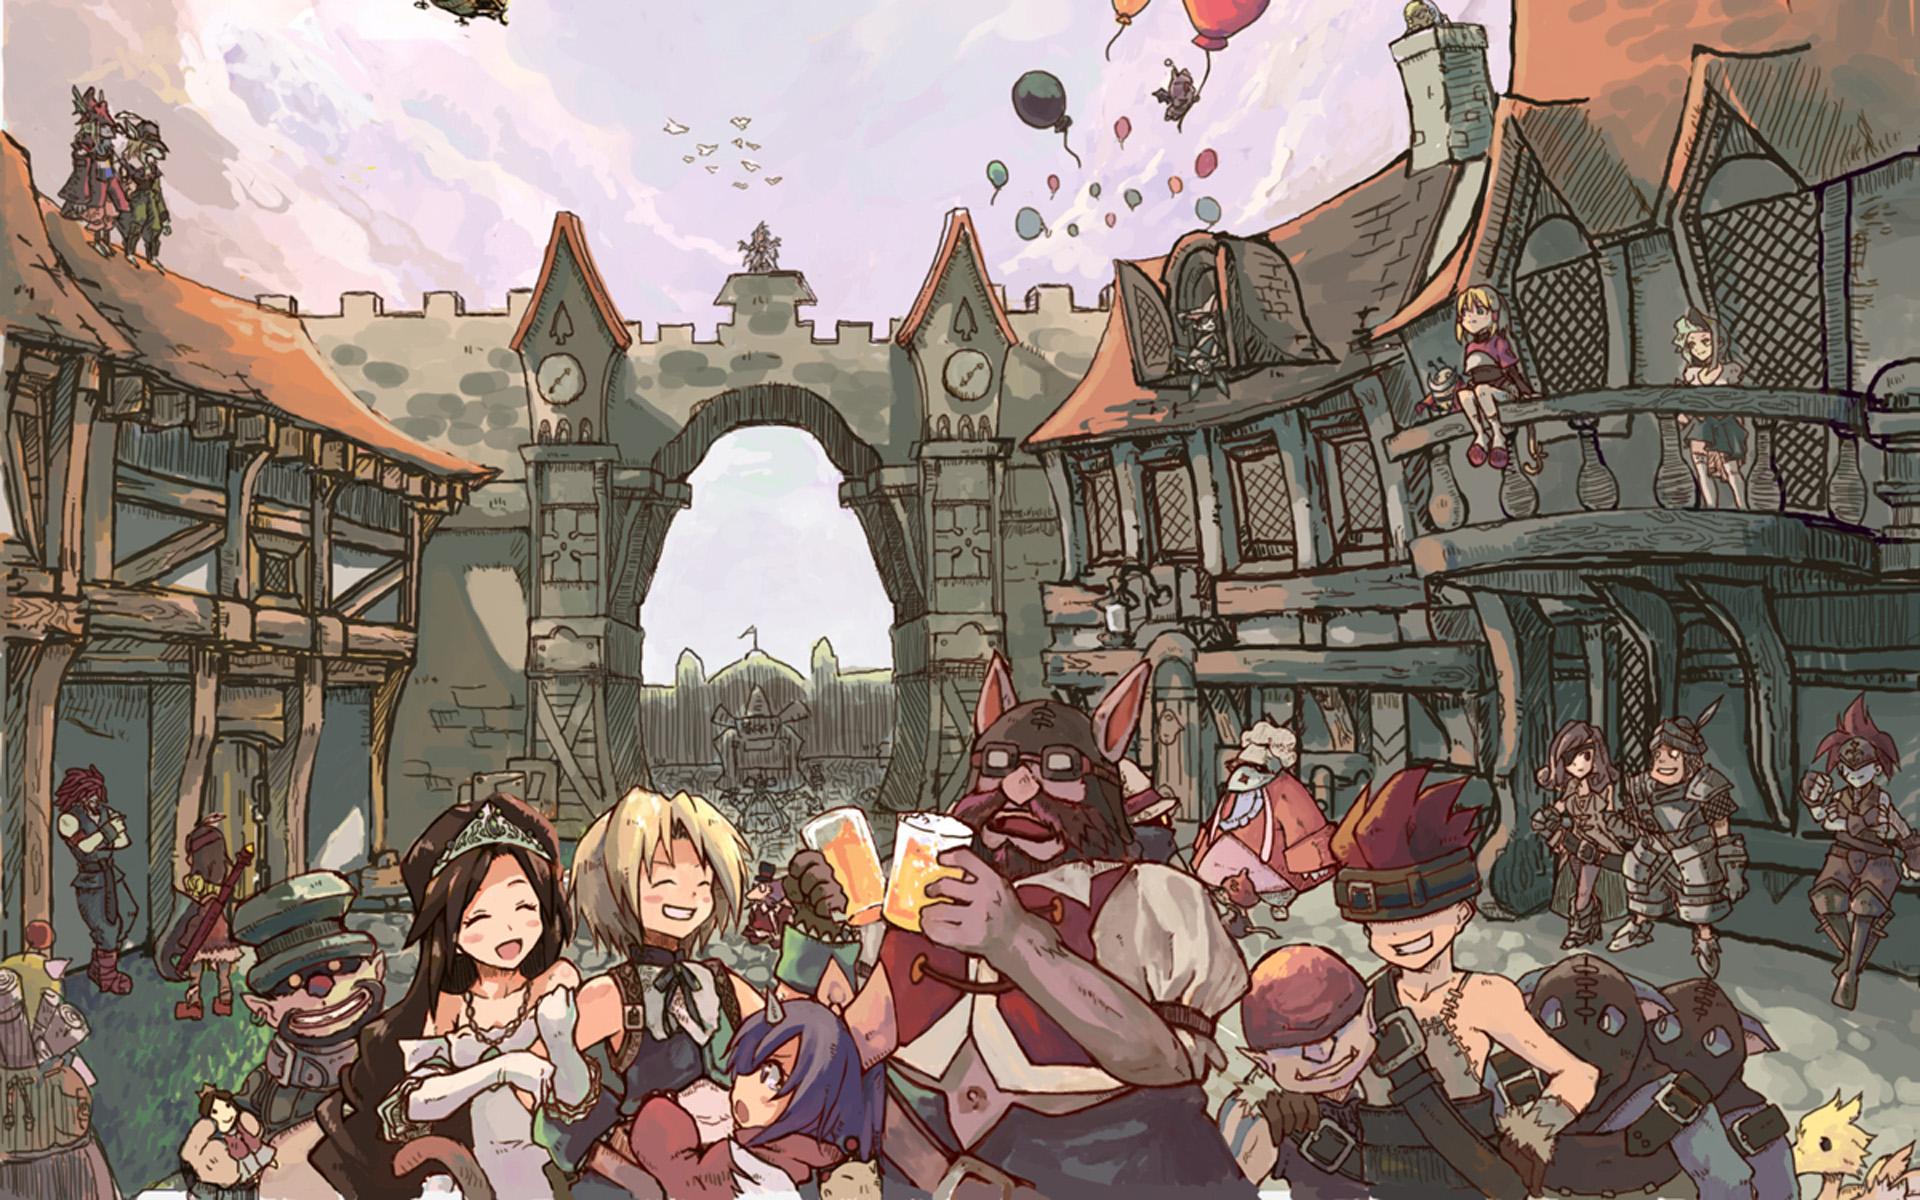 Final Fantasy Ix Wallpaper: Final Fantasy, Vivi (Final Fantasy IX), Final Fantasy IX